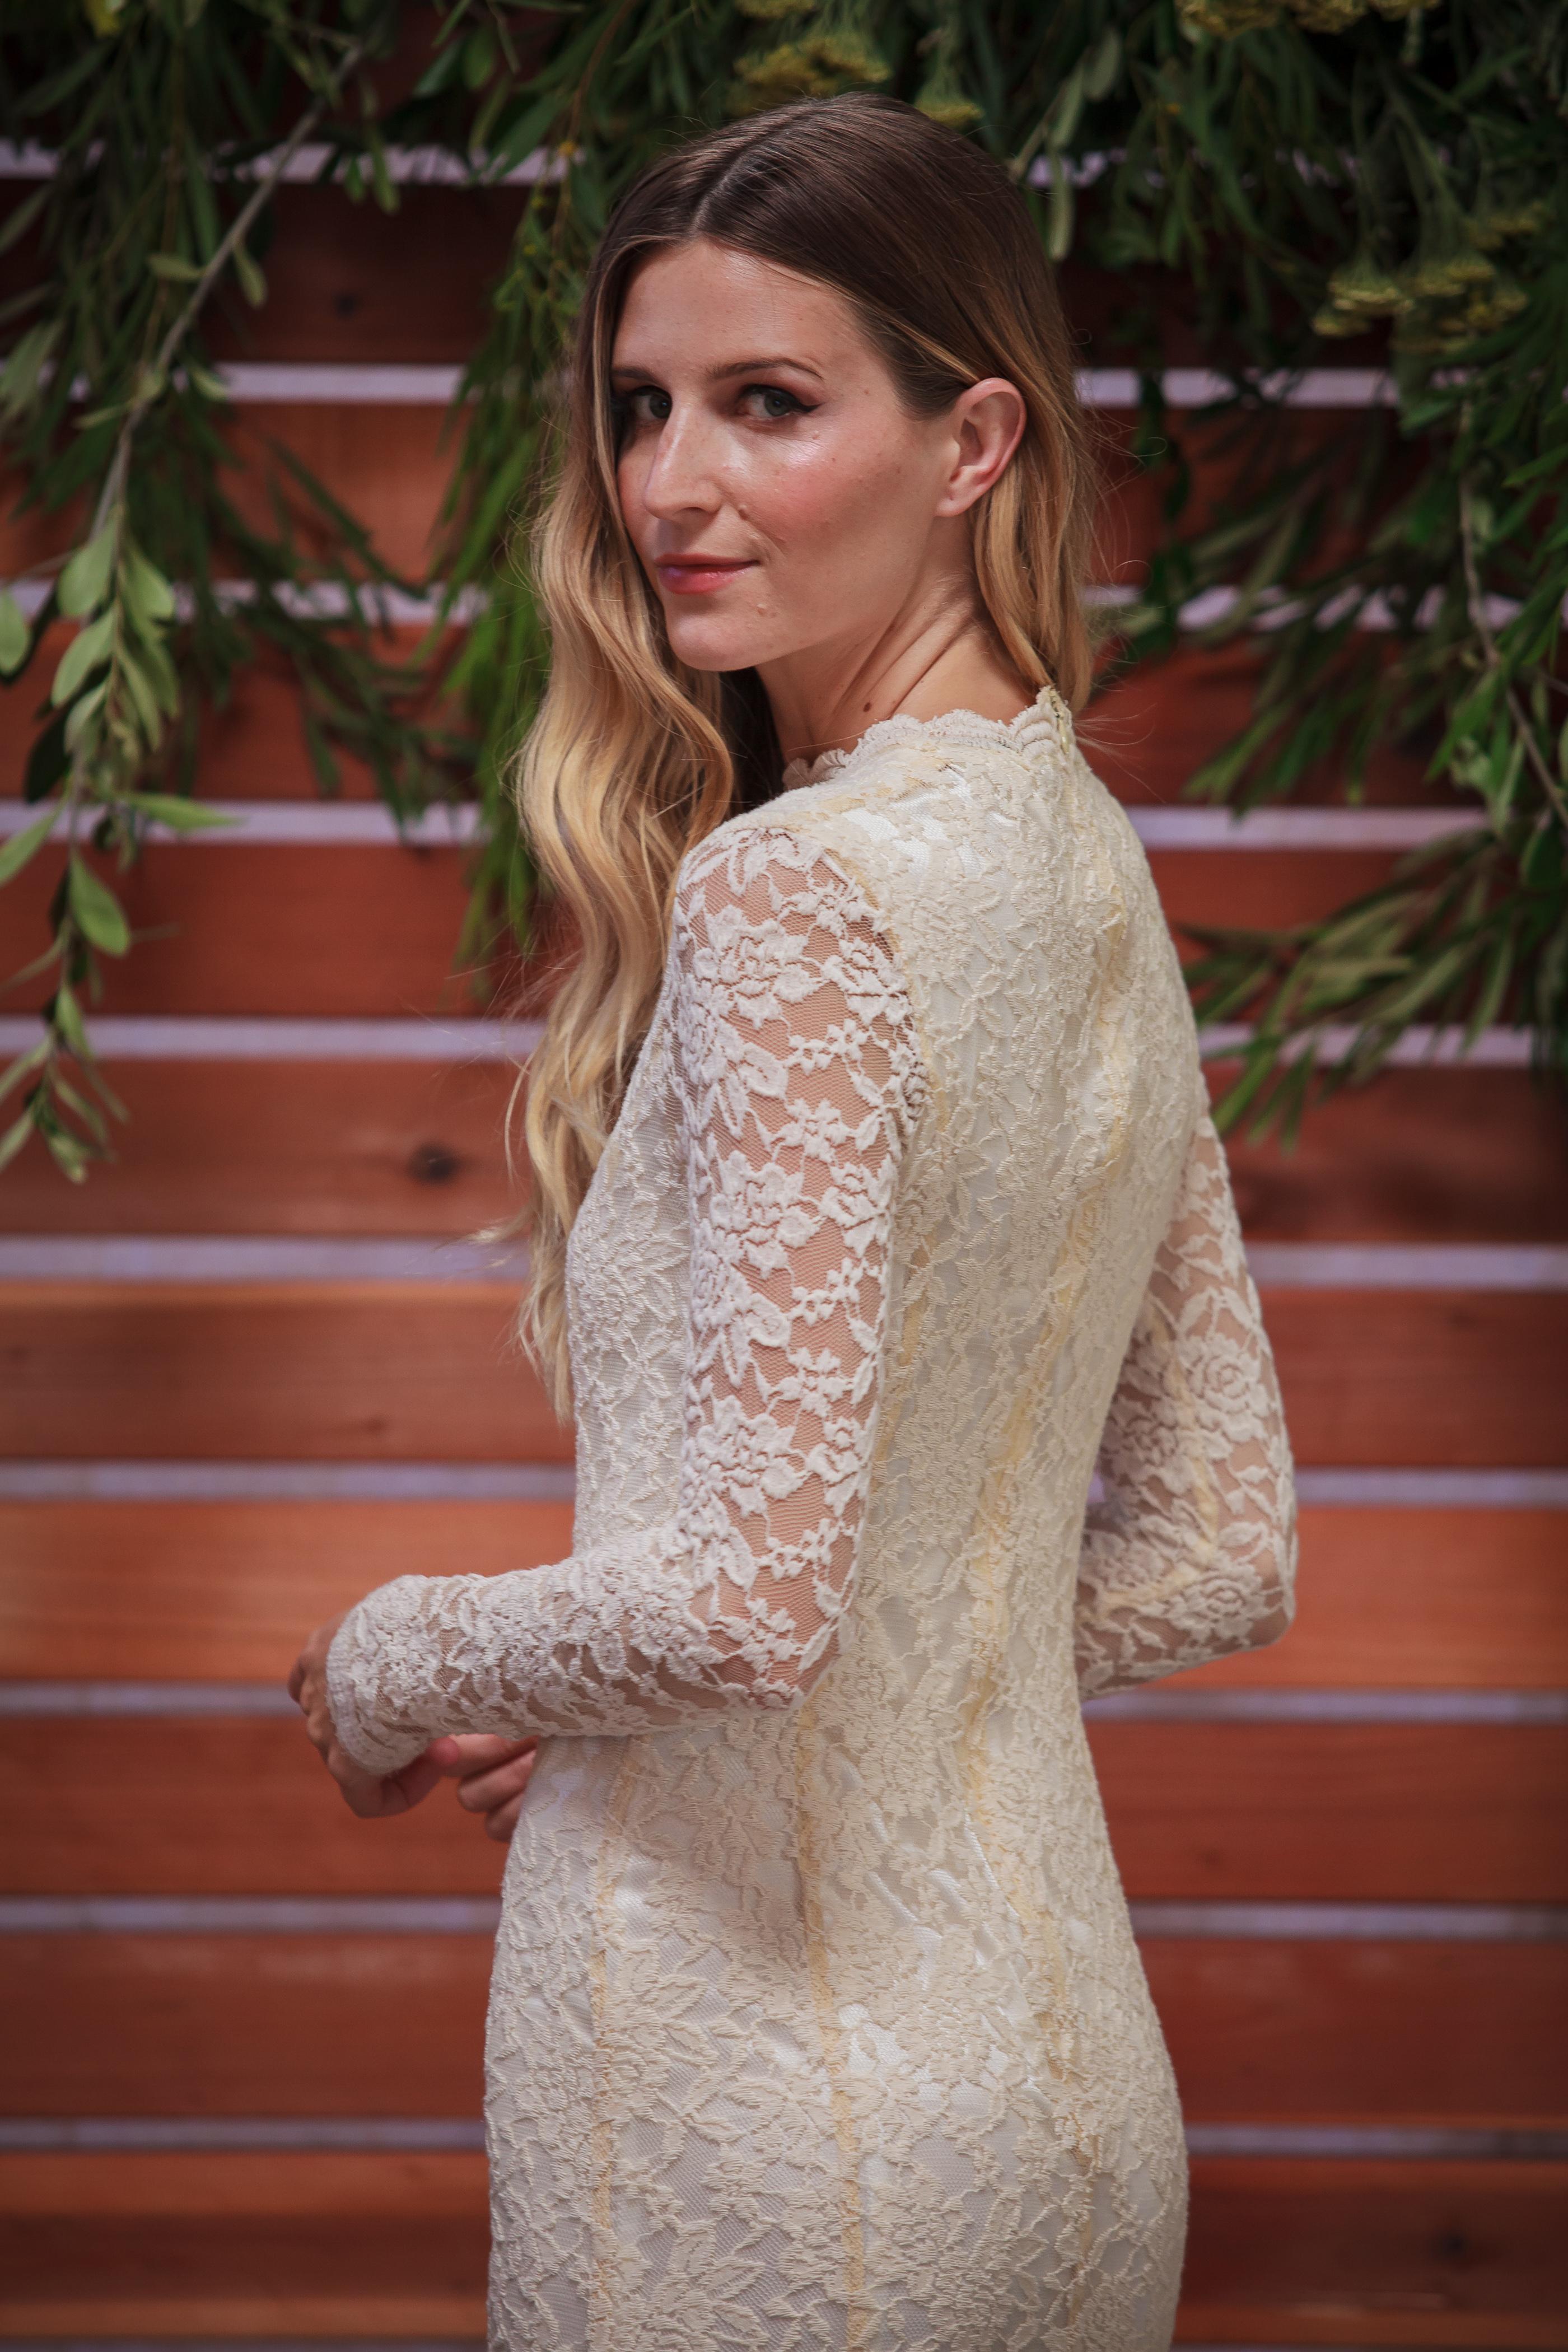 long-sleeve-simple-lace-wedding-dress-for-the-laid-back-boho-bride